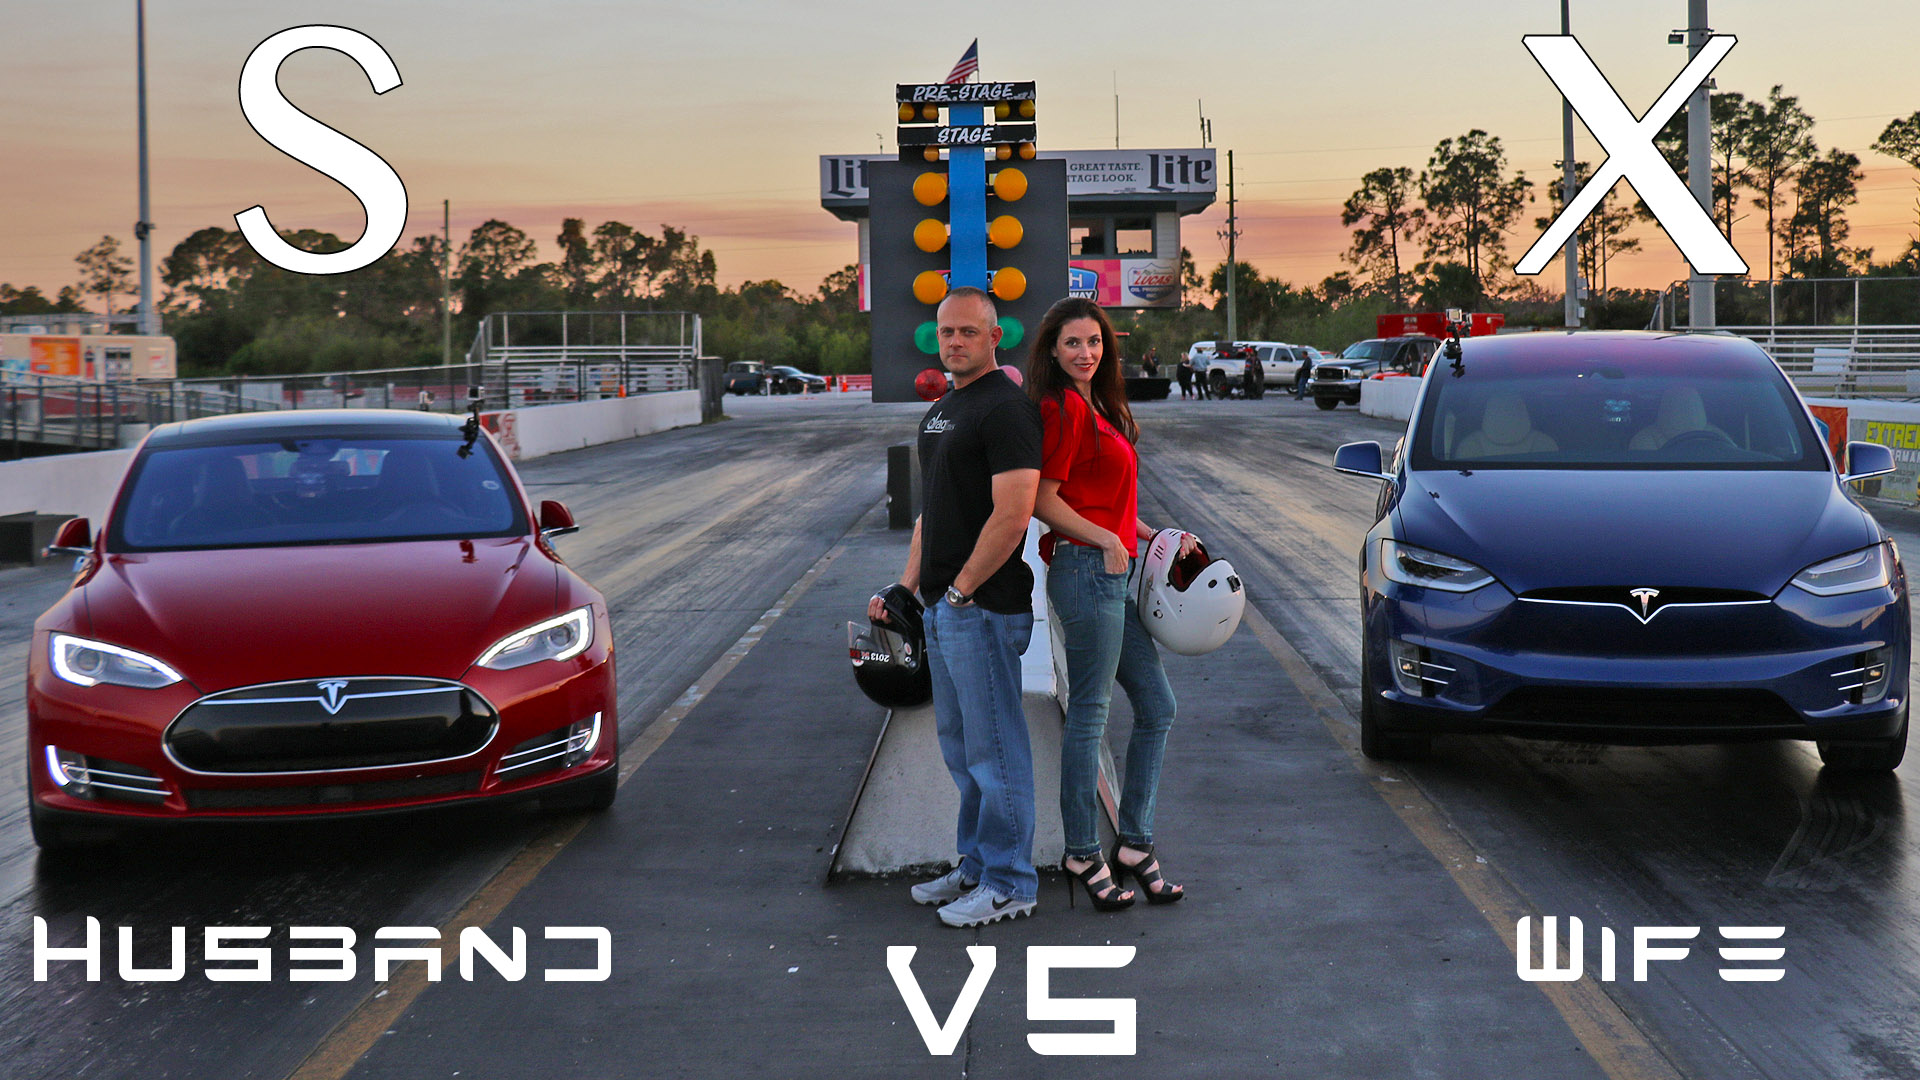 Tesla Model X vs Model S P90D Ludicrous – World Record Set During Husband vs Wife Drag Racing 1/4 Mile Showdown